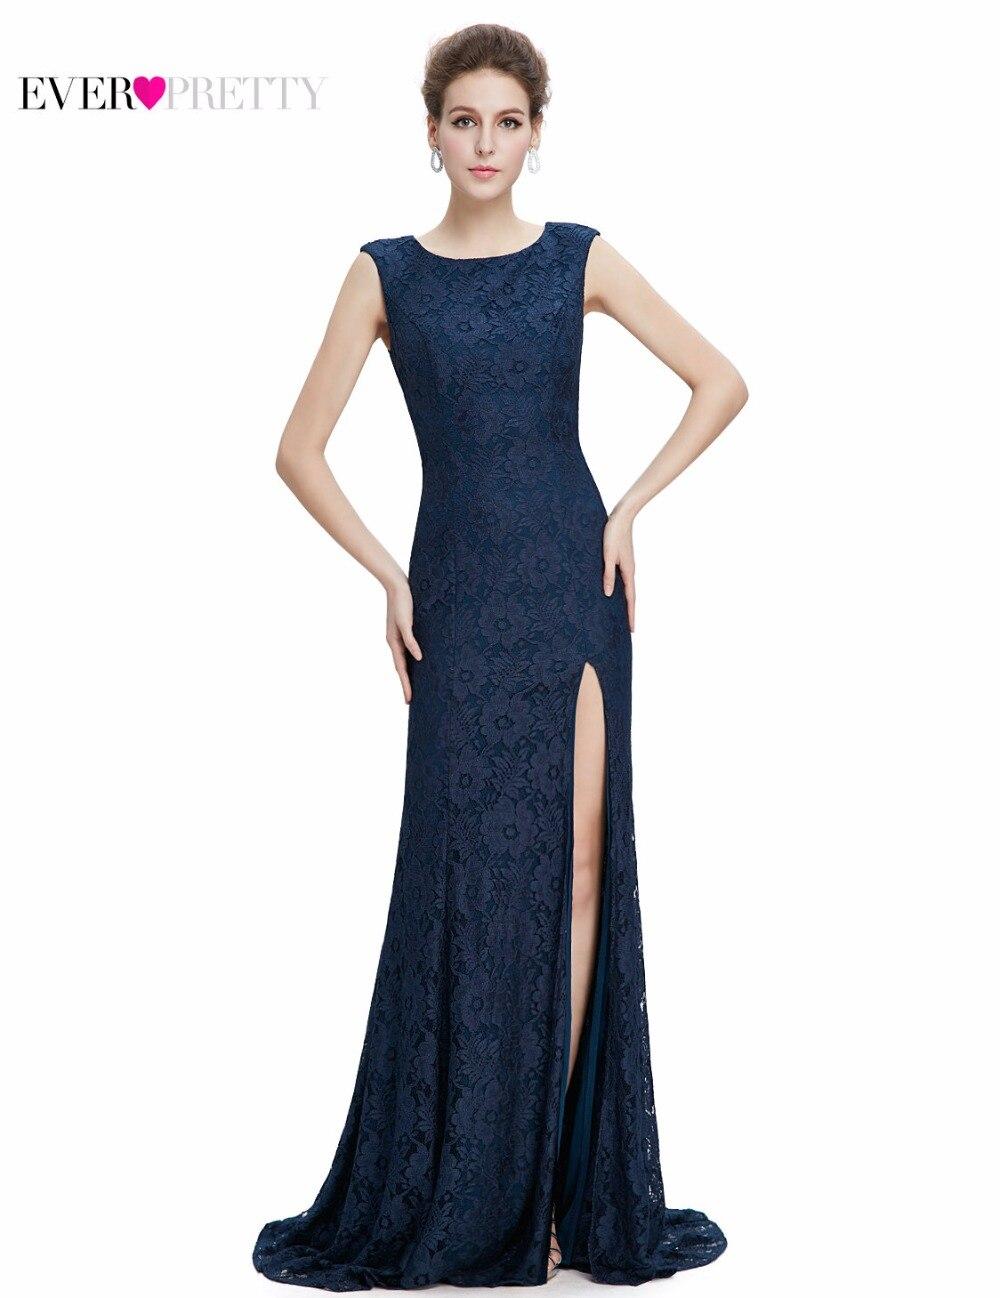 elegant formal dresses 2017 - photo #17